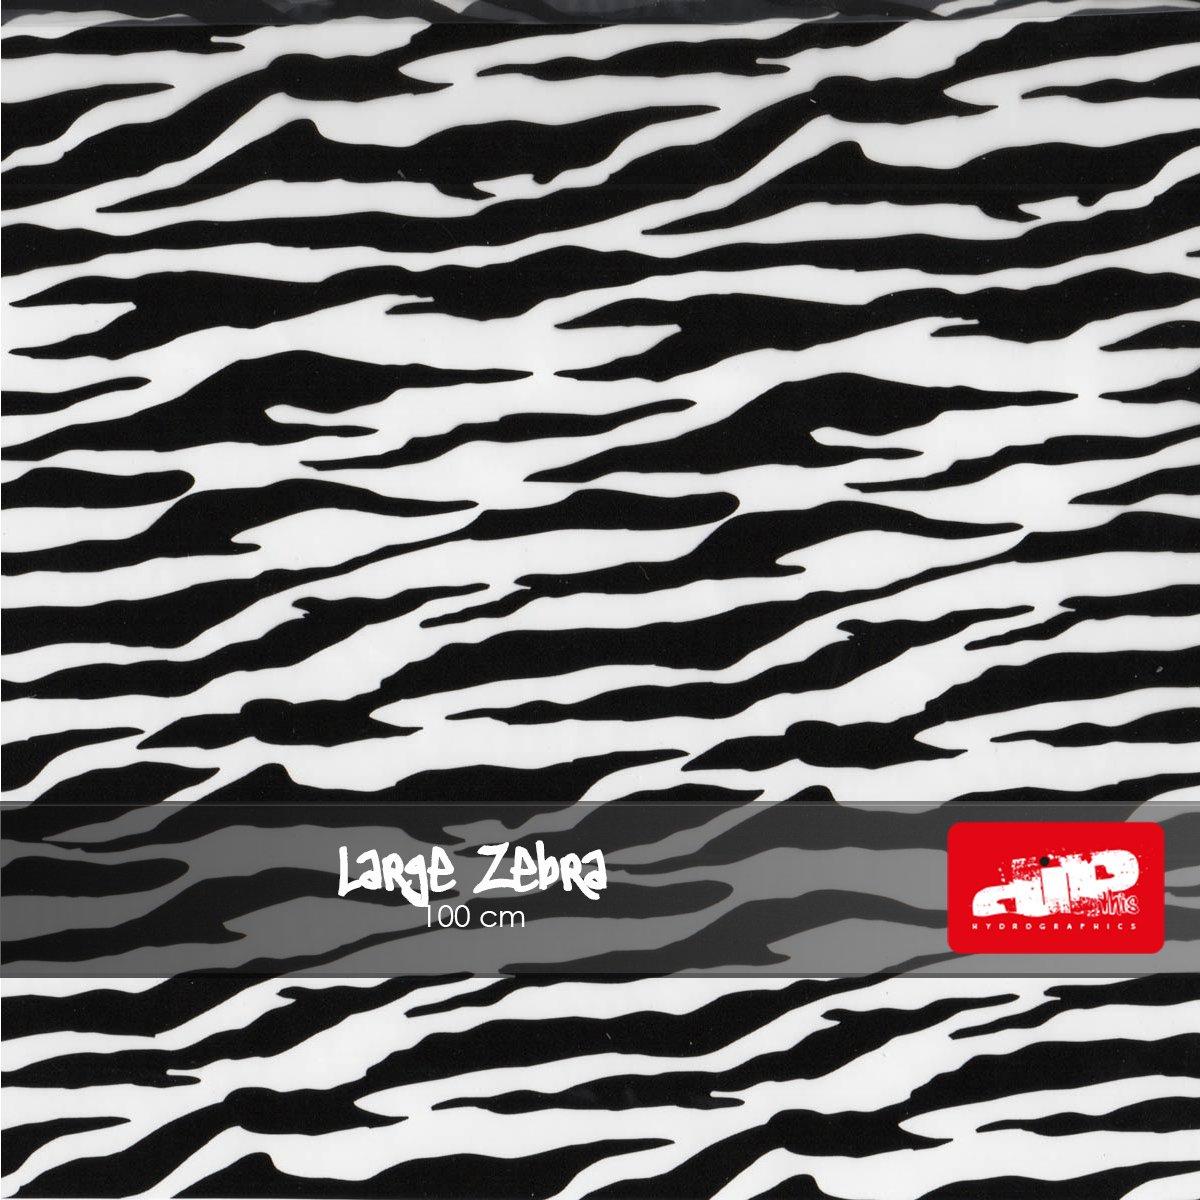 Large Zebra